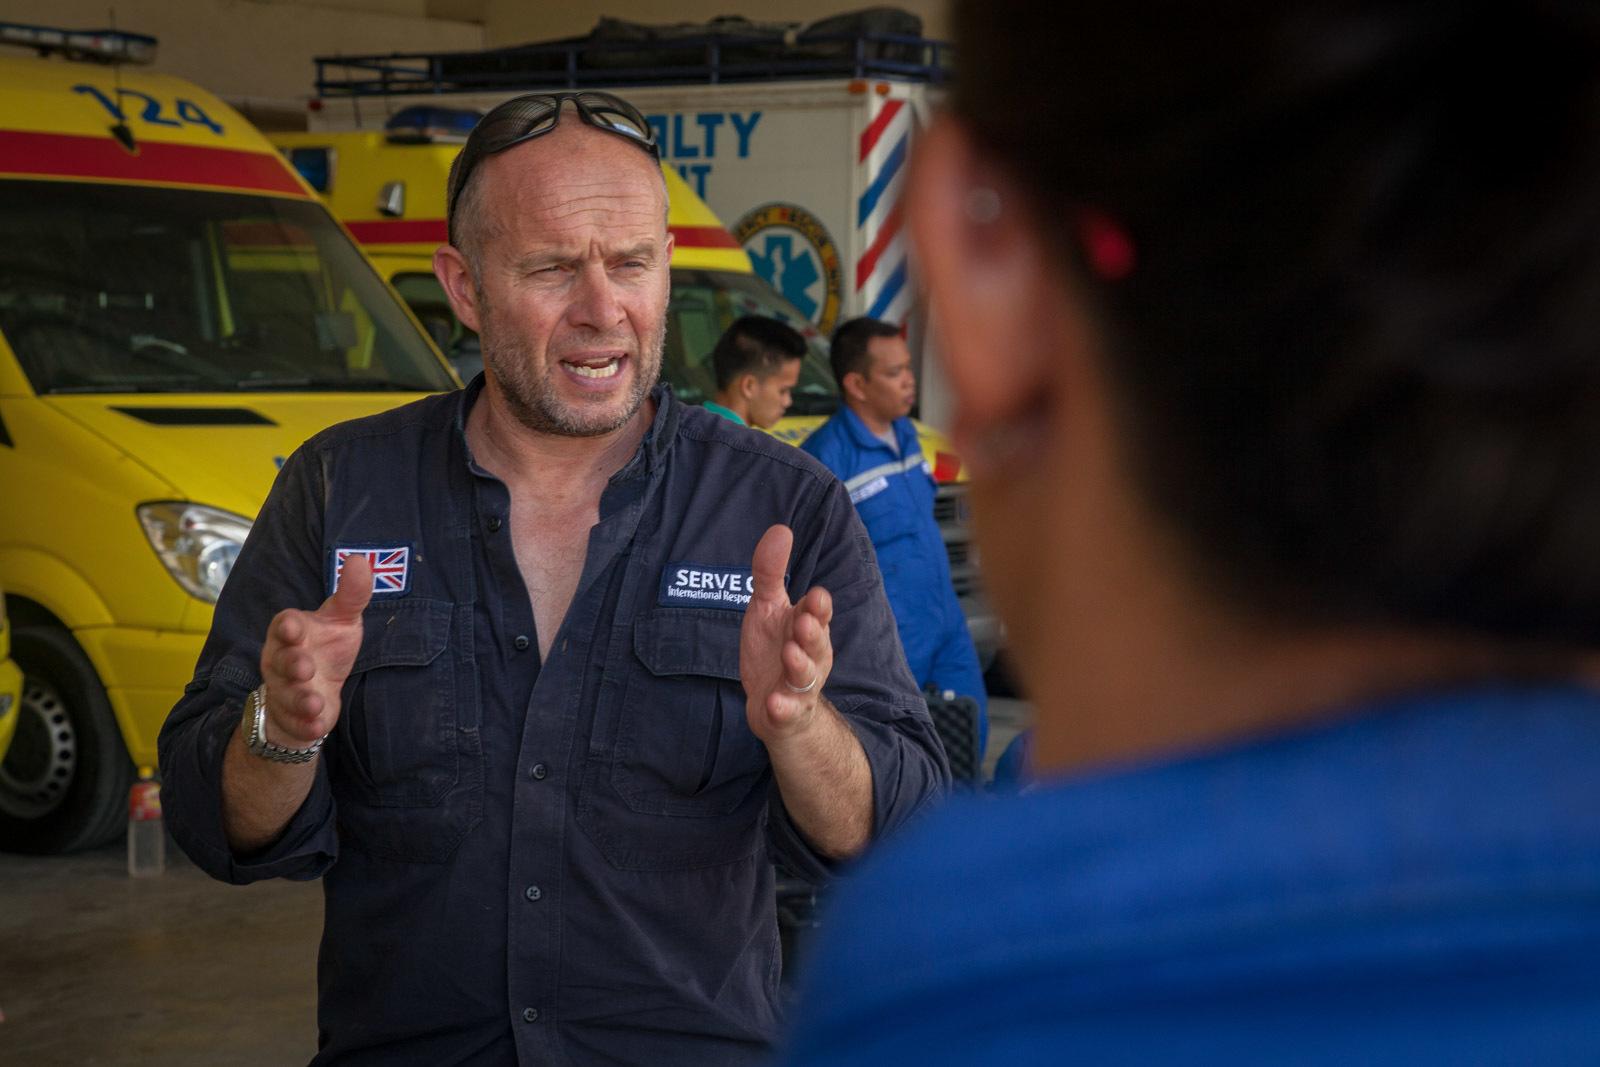 IRT member Nick Borritt instructs local emergency responders.